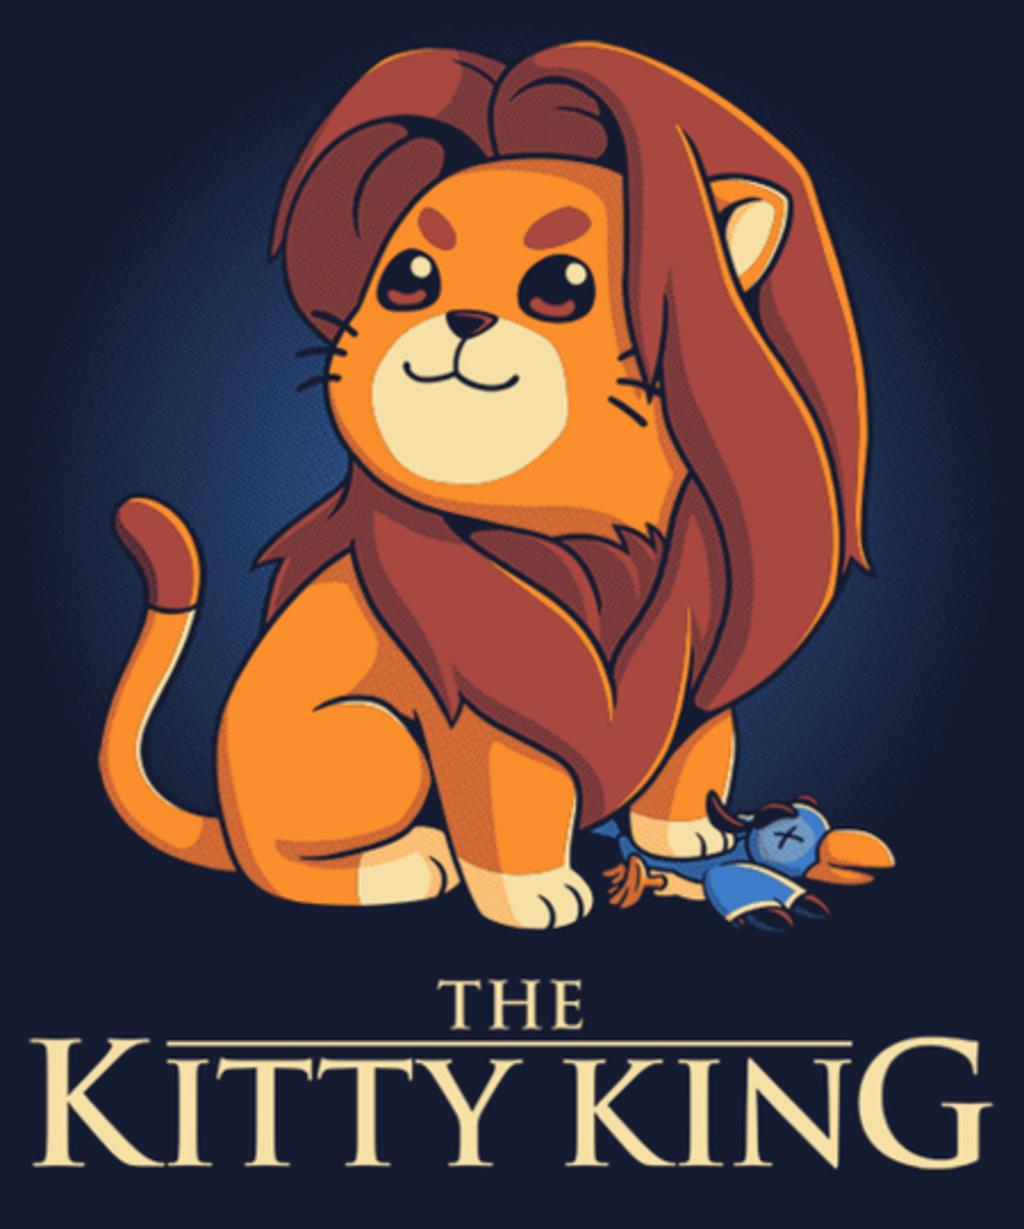 Qwertee: The Kitty King